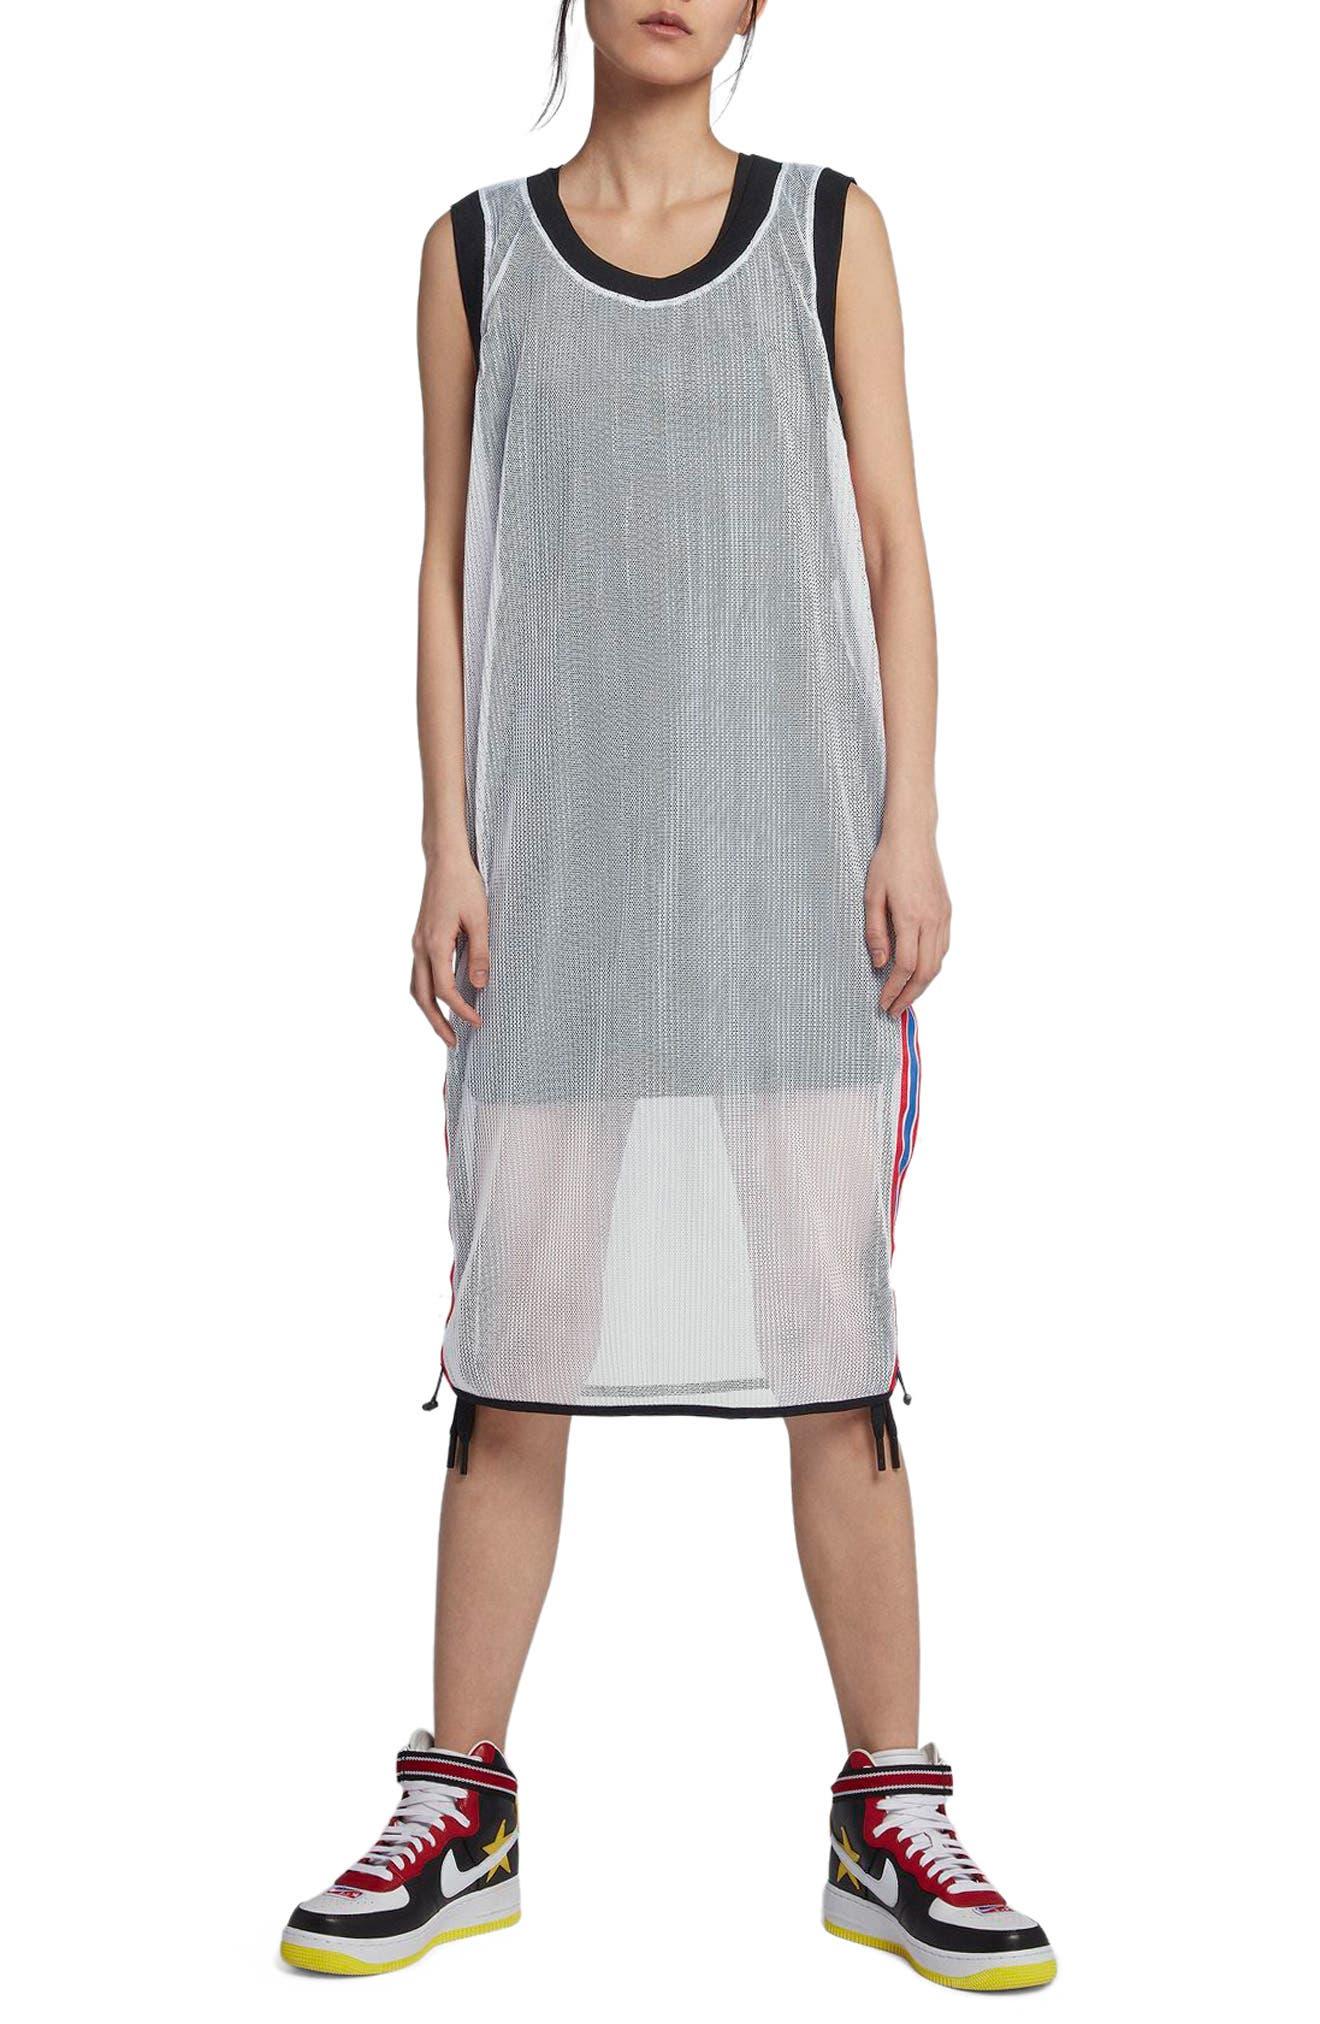 NikeLab x RT Mesh Jersey Dress,                             Main thumbnail 1, color,                             100